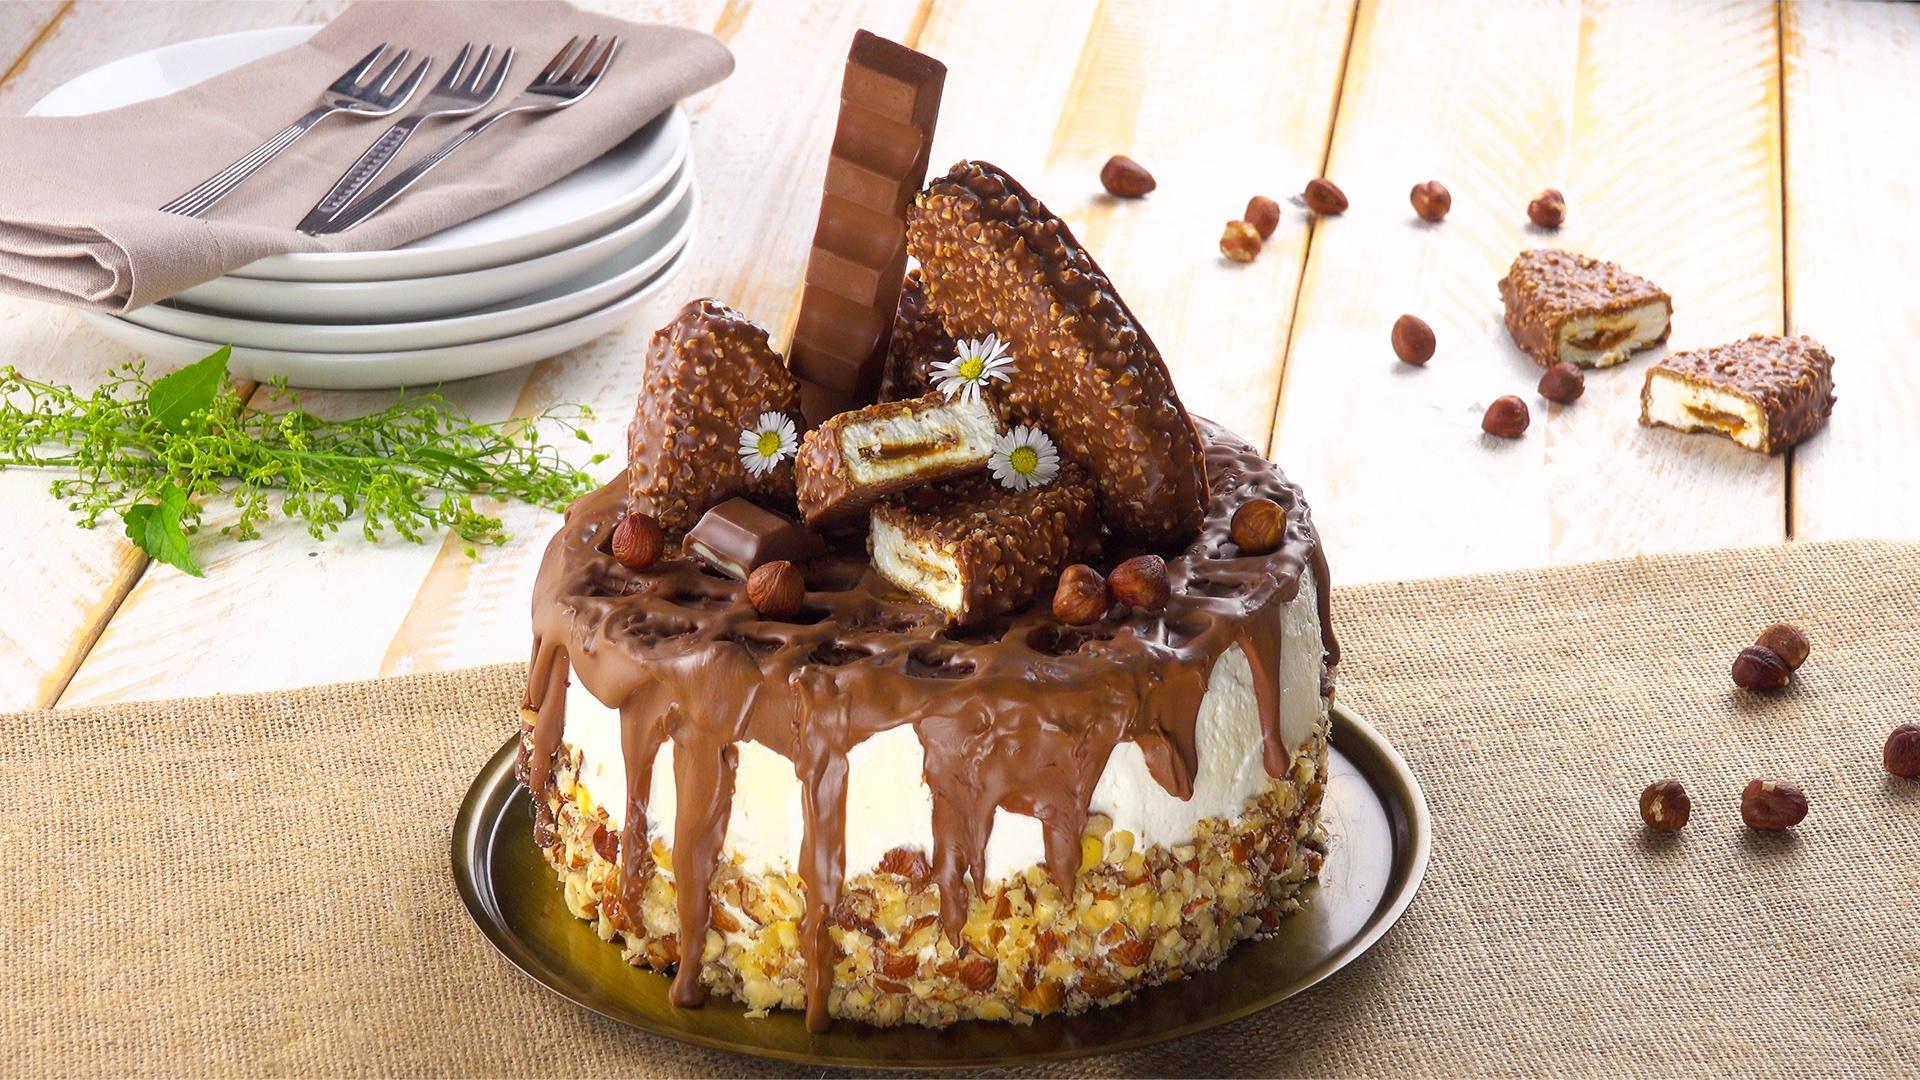 Molto Torta Kinder Maxi King: un dolcissimo gusto in versione extra-large. PB83